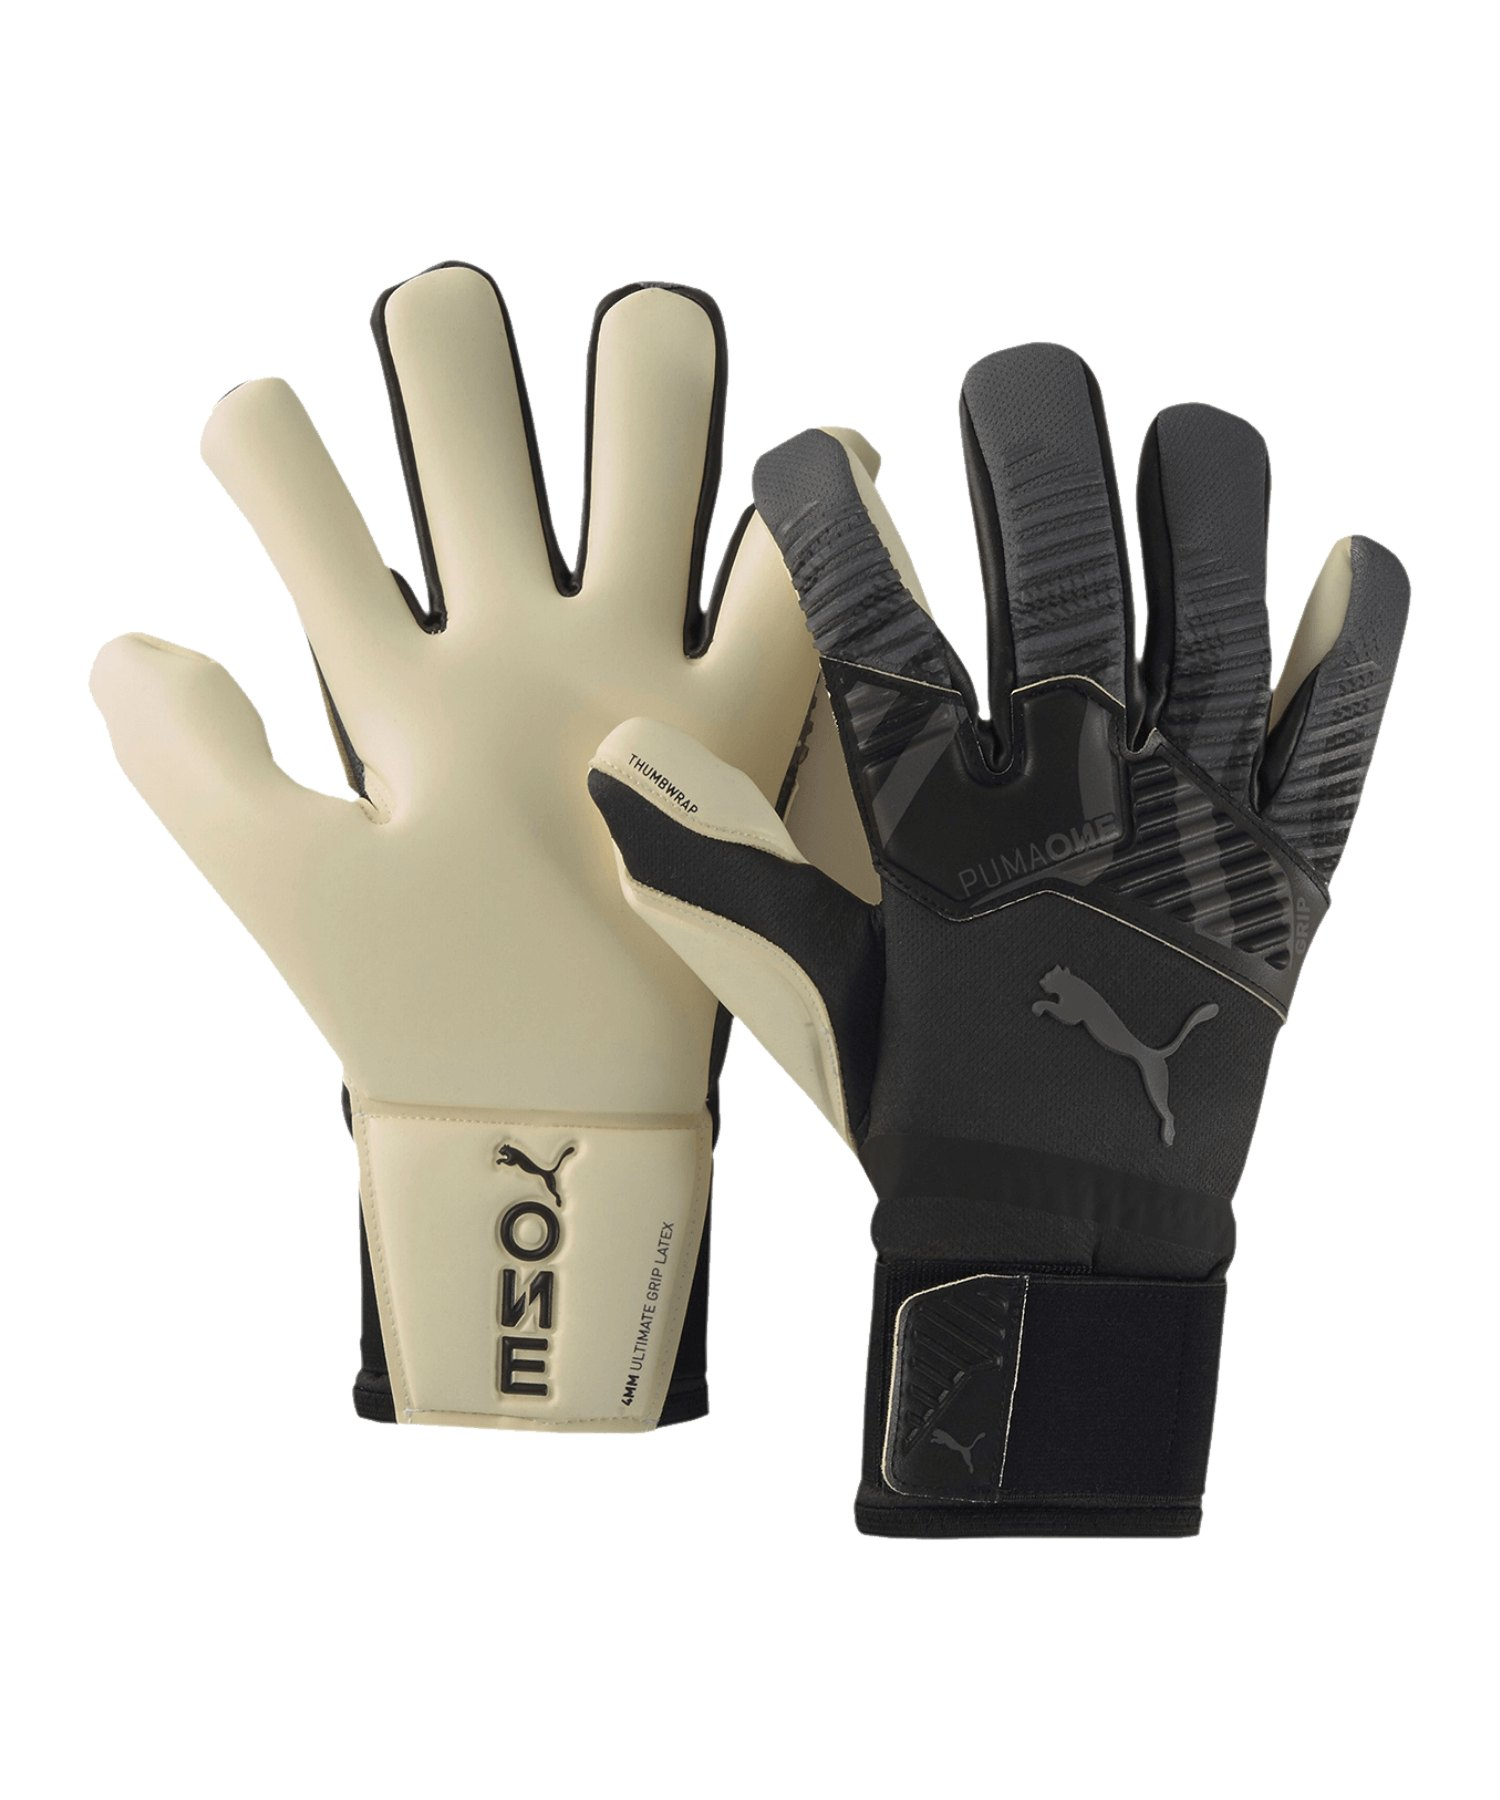 PUMA One Grip 1 Hybrid Pro TW-Handschuh F03 - schwarz